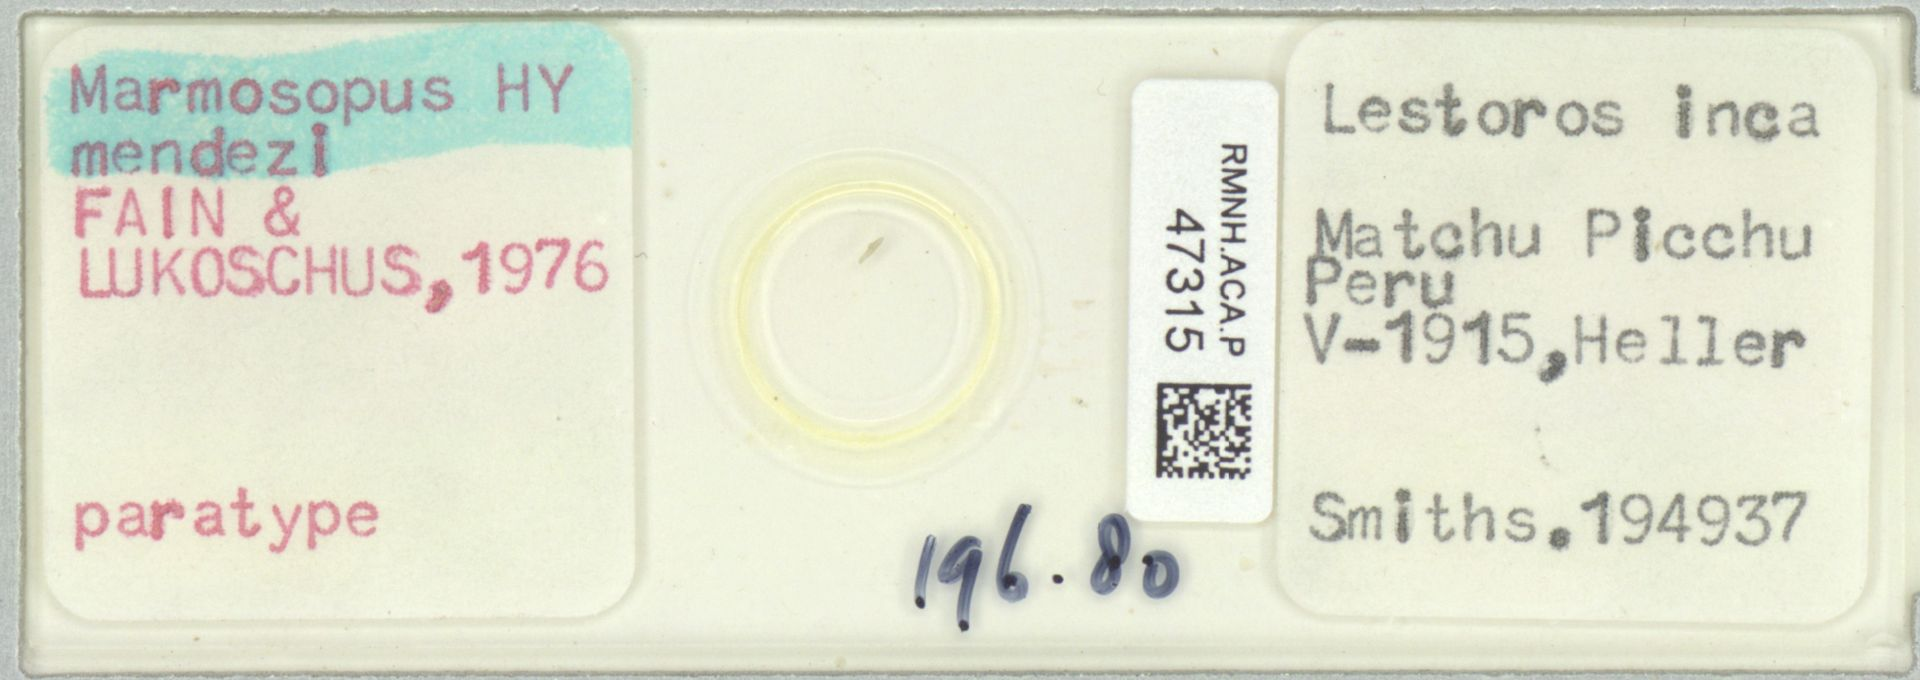 RMNH.ACA.P.47315 | Marmosopus mendezi Fain, Lukoschus 1976